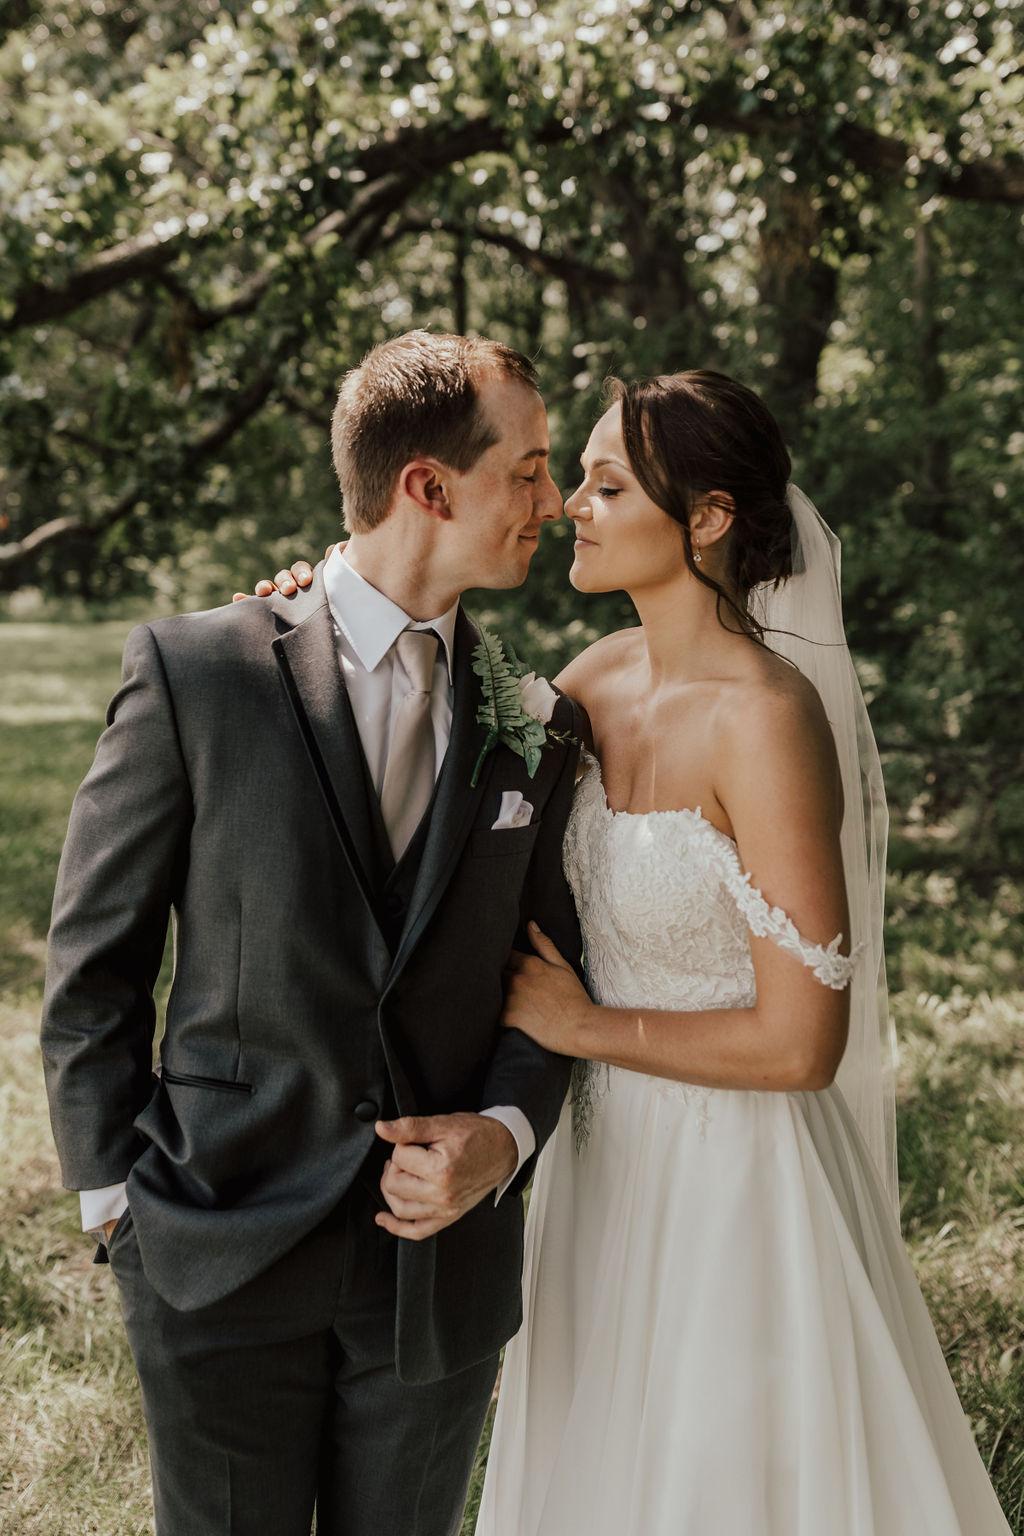 StLouis-Wedding-Photographer-Taylor+Michael-Portraits29.jpg